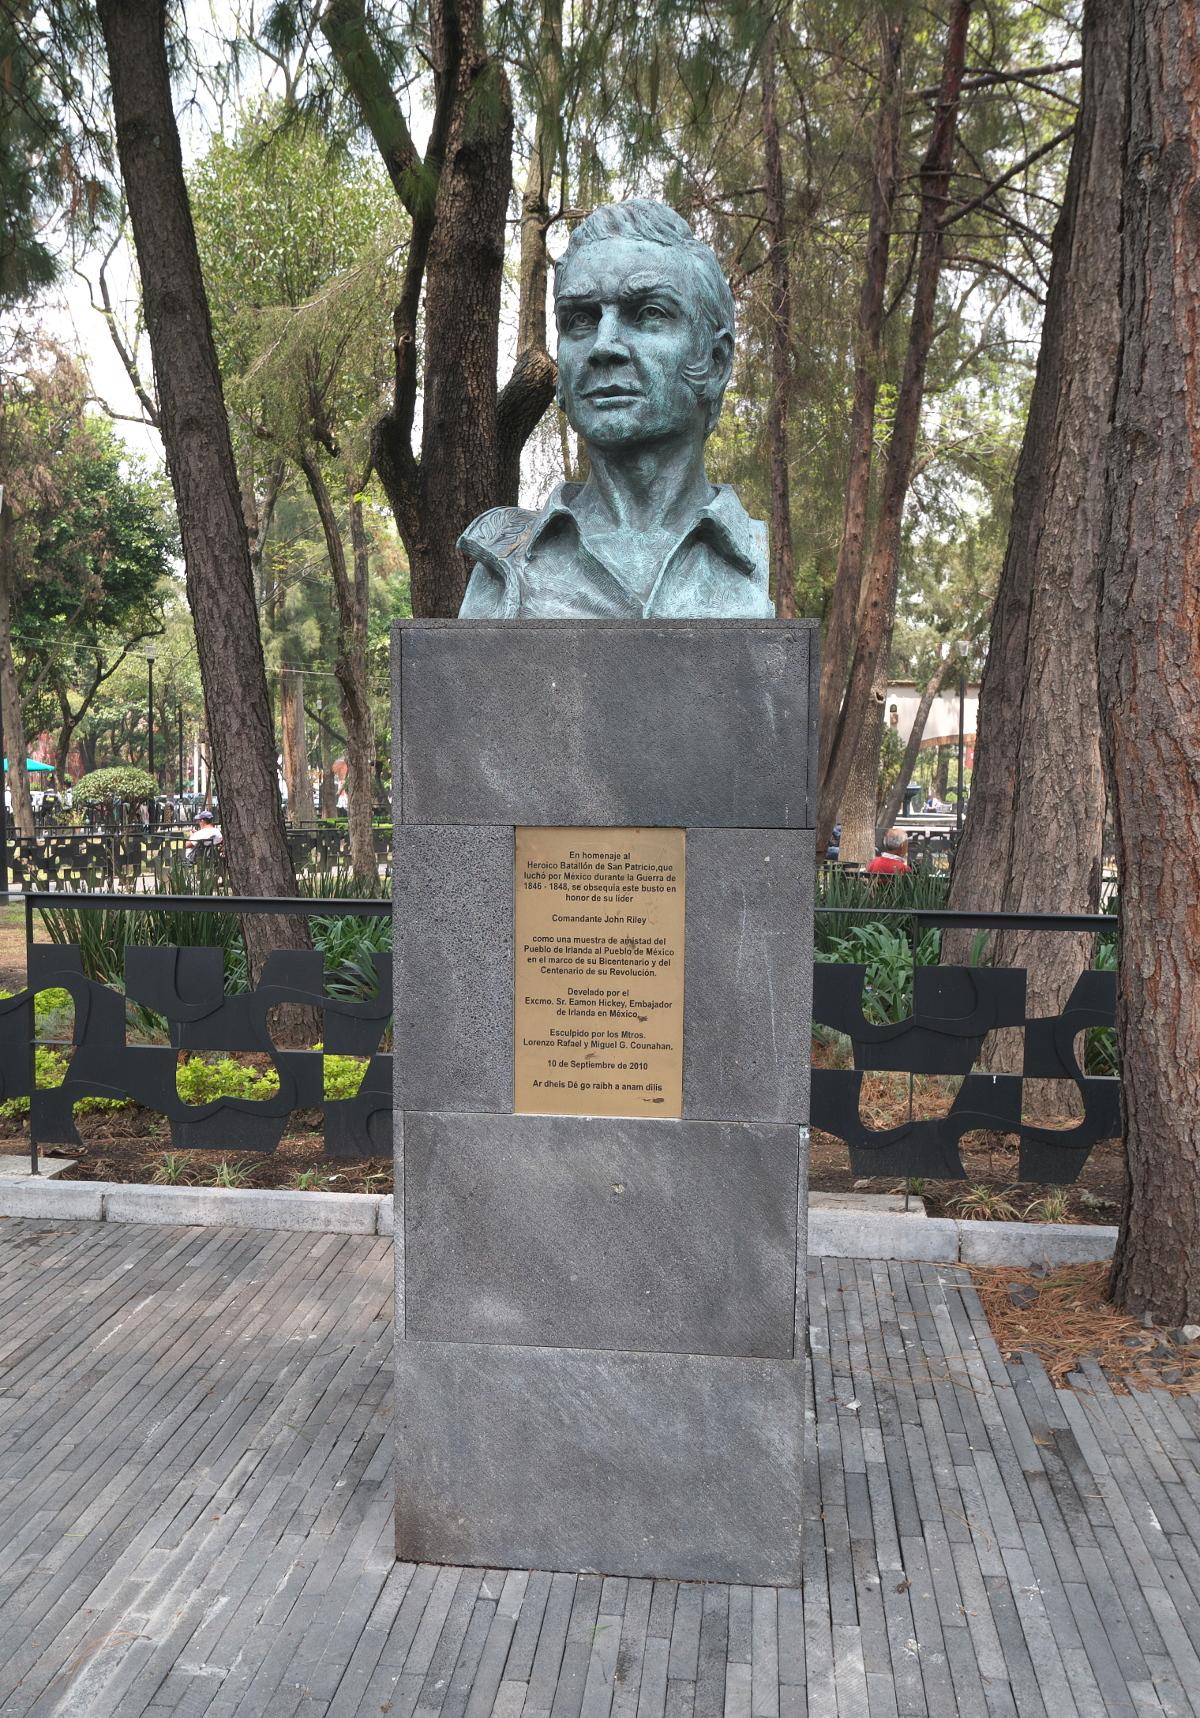 Monument to Comandante John Riley of the Sanpatricios, erected in 2010.